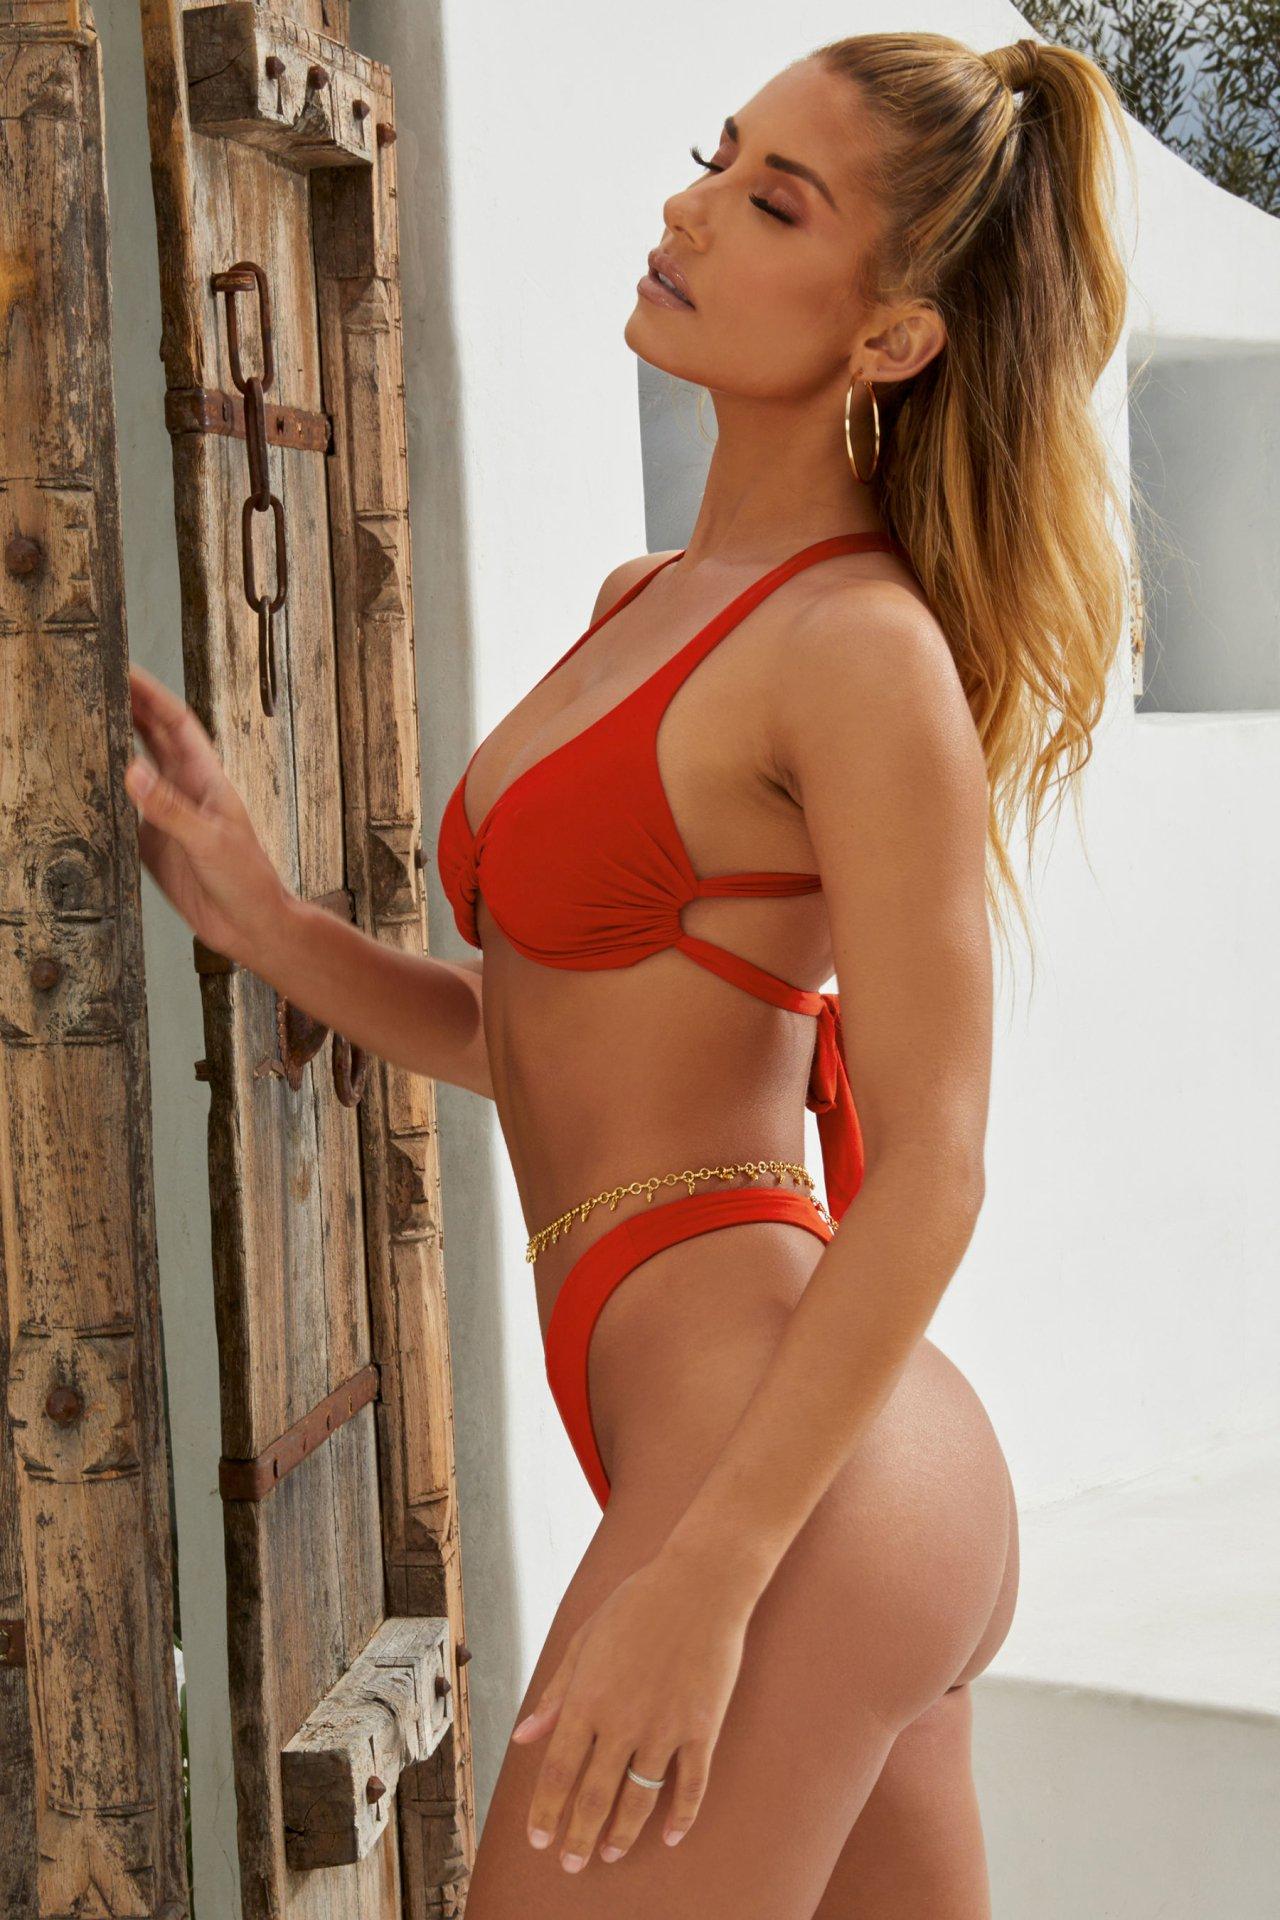 Sierra Skye Sexy Body